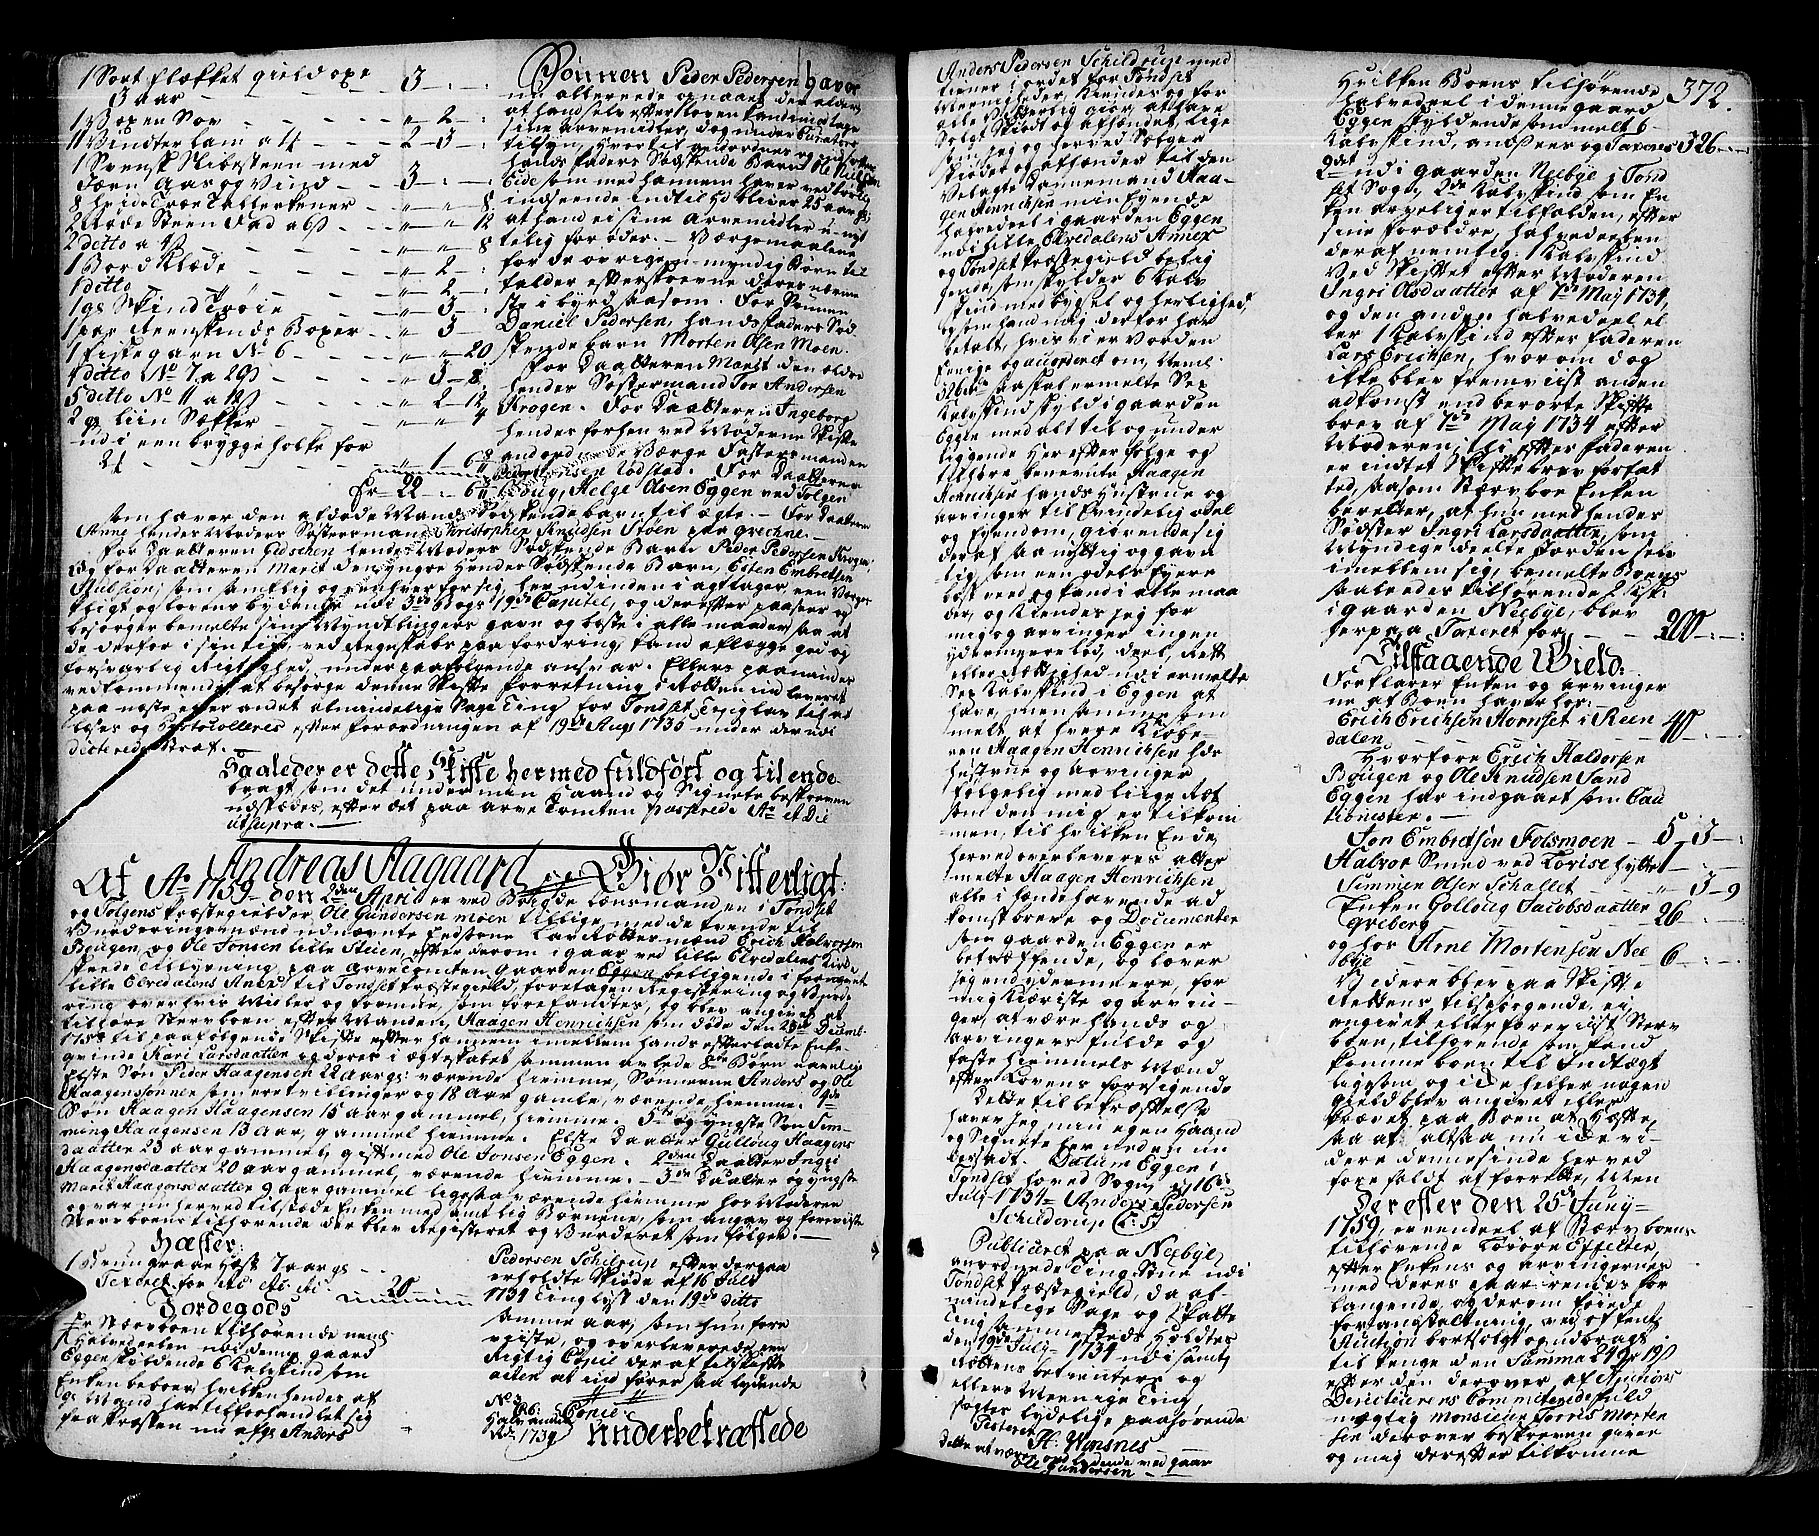 SAH, Solør og Østerdalen sorenskriveri, J/Ja/L0012A: Skifteprotokoll, 1757-1764, s. 371b-372a